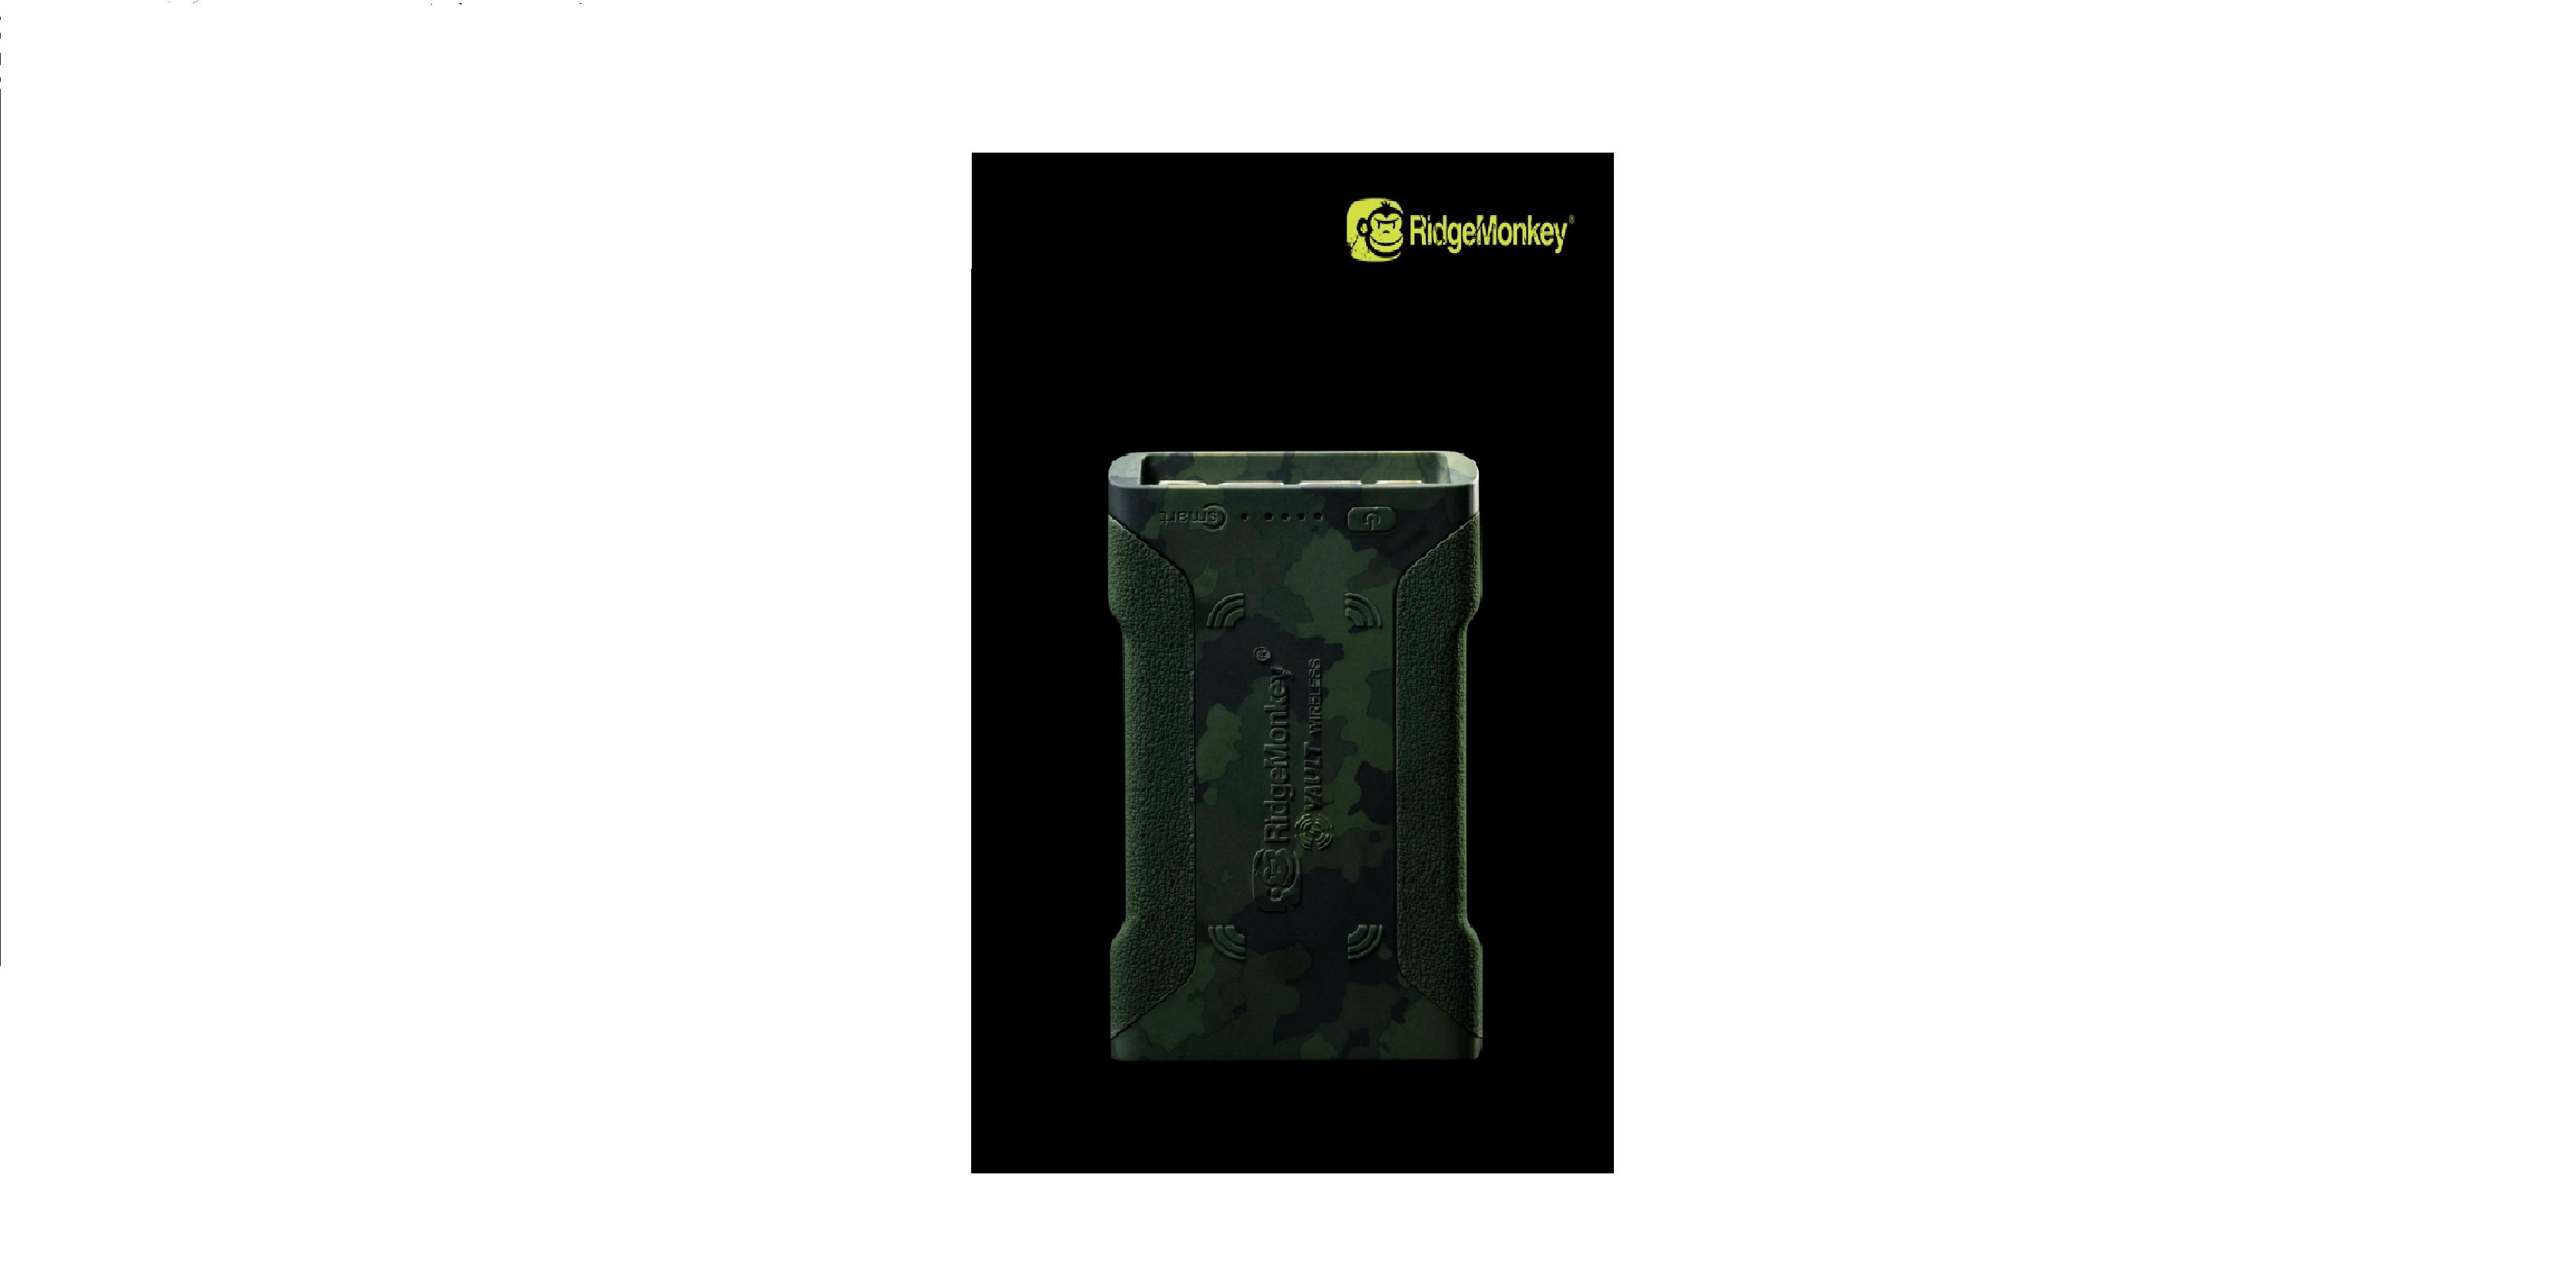 Powerbank Ridge Monkey Vault C-Smart Wireless 26950 mAh cod RM486